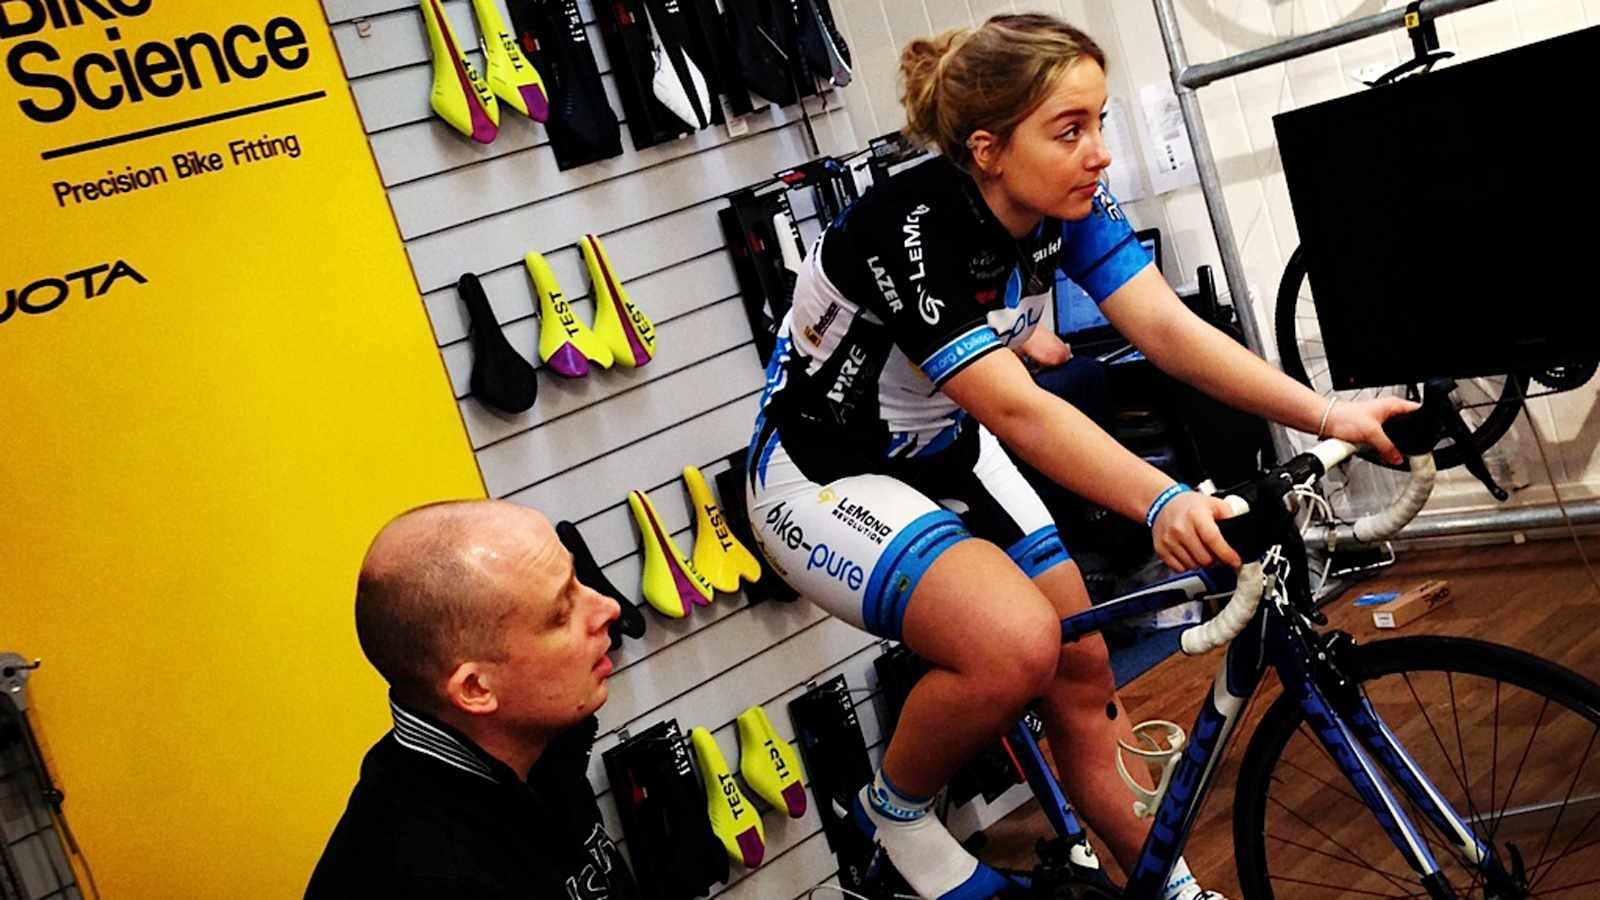 Visit the BikeRadar Facebook page on Thursday, 4 September for free expert advice